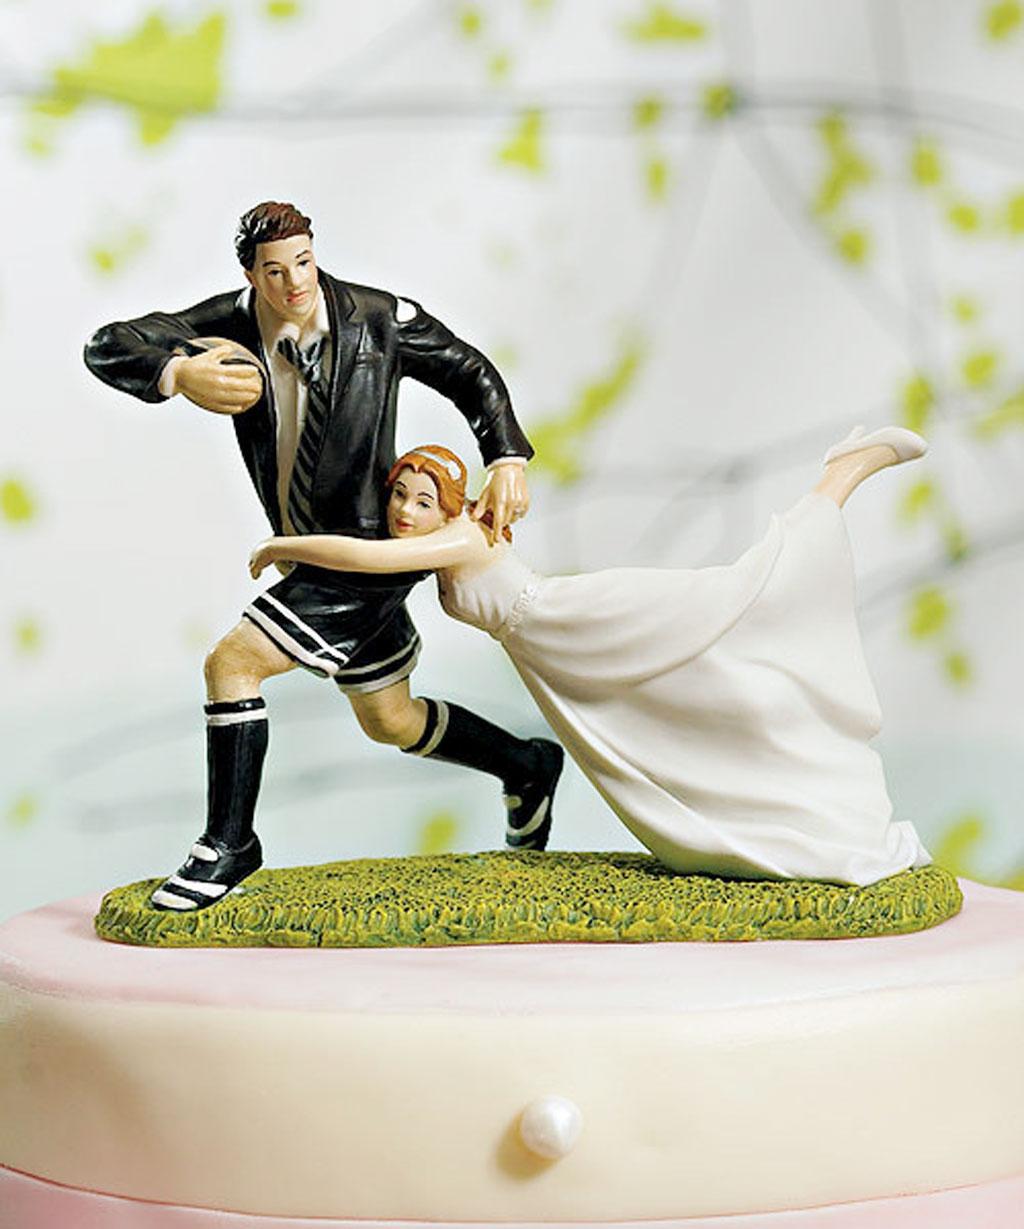 Weddingstar Cake Topper Picture In Wedding